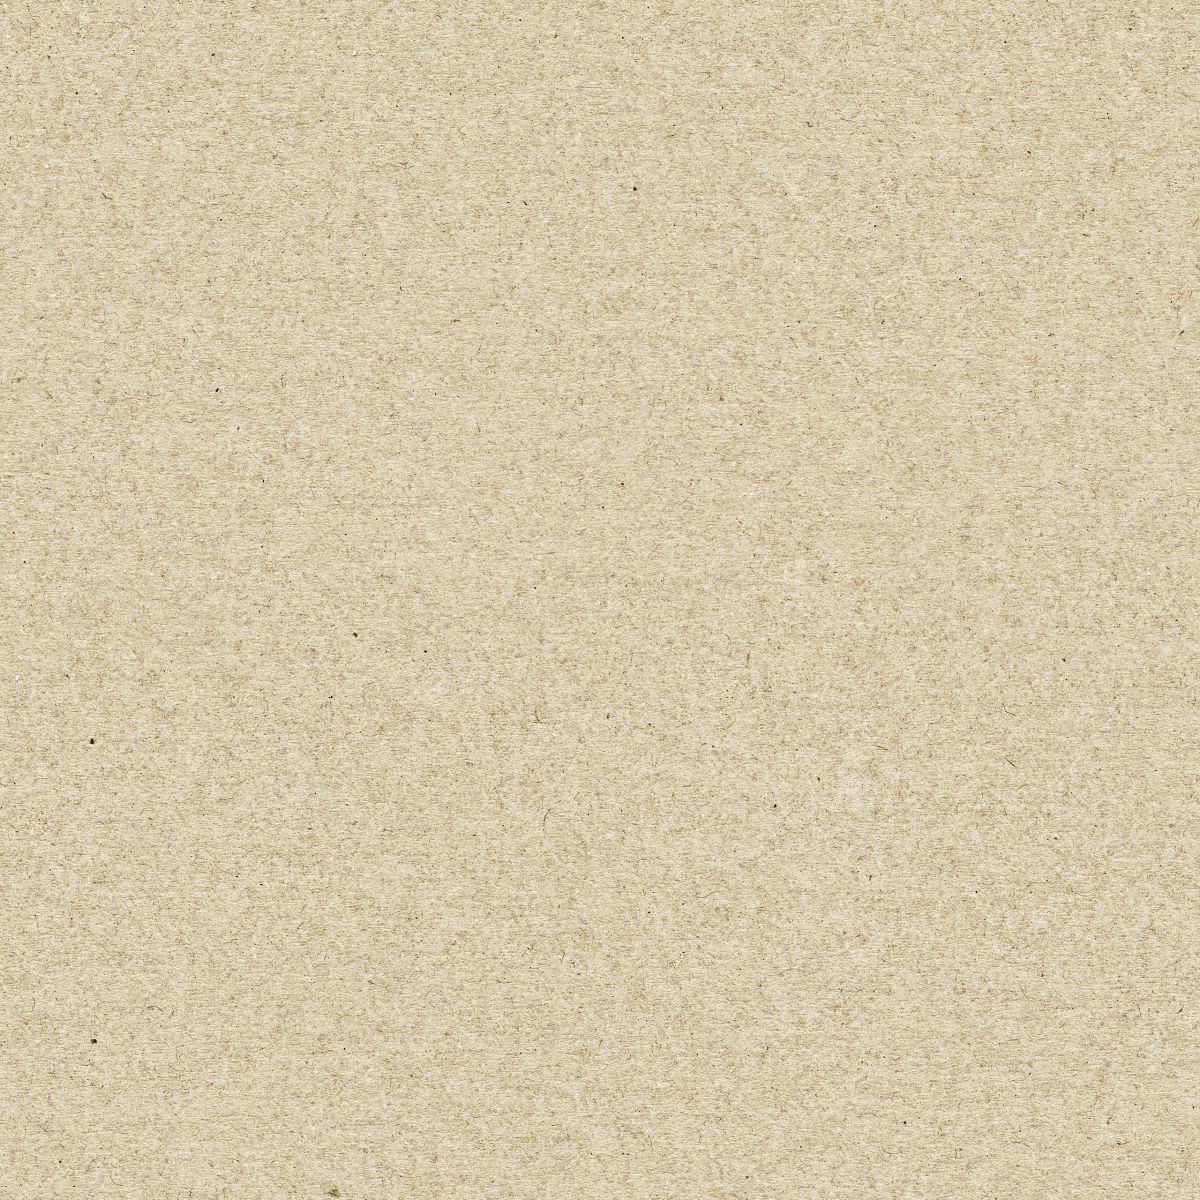 paper texture seamless